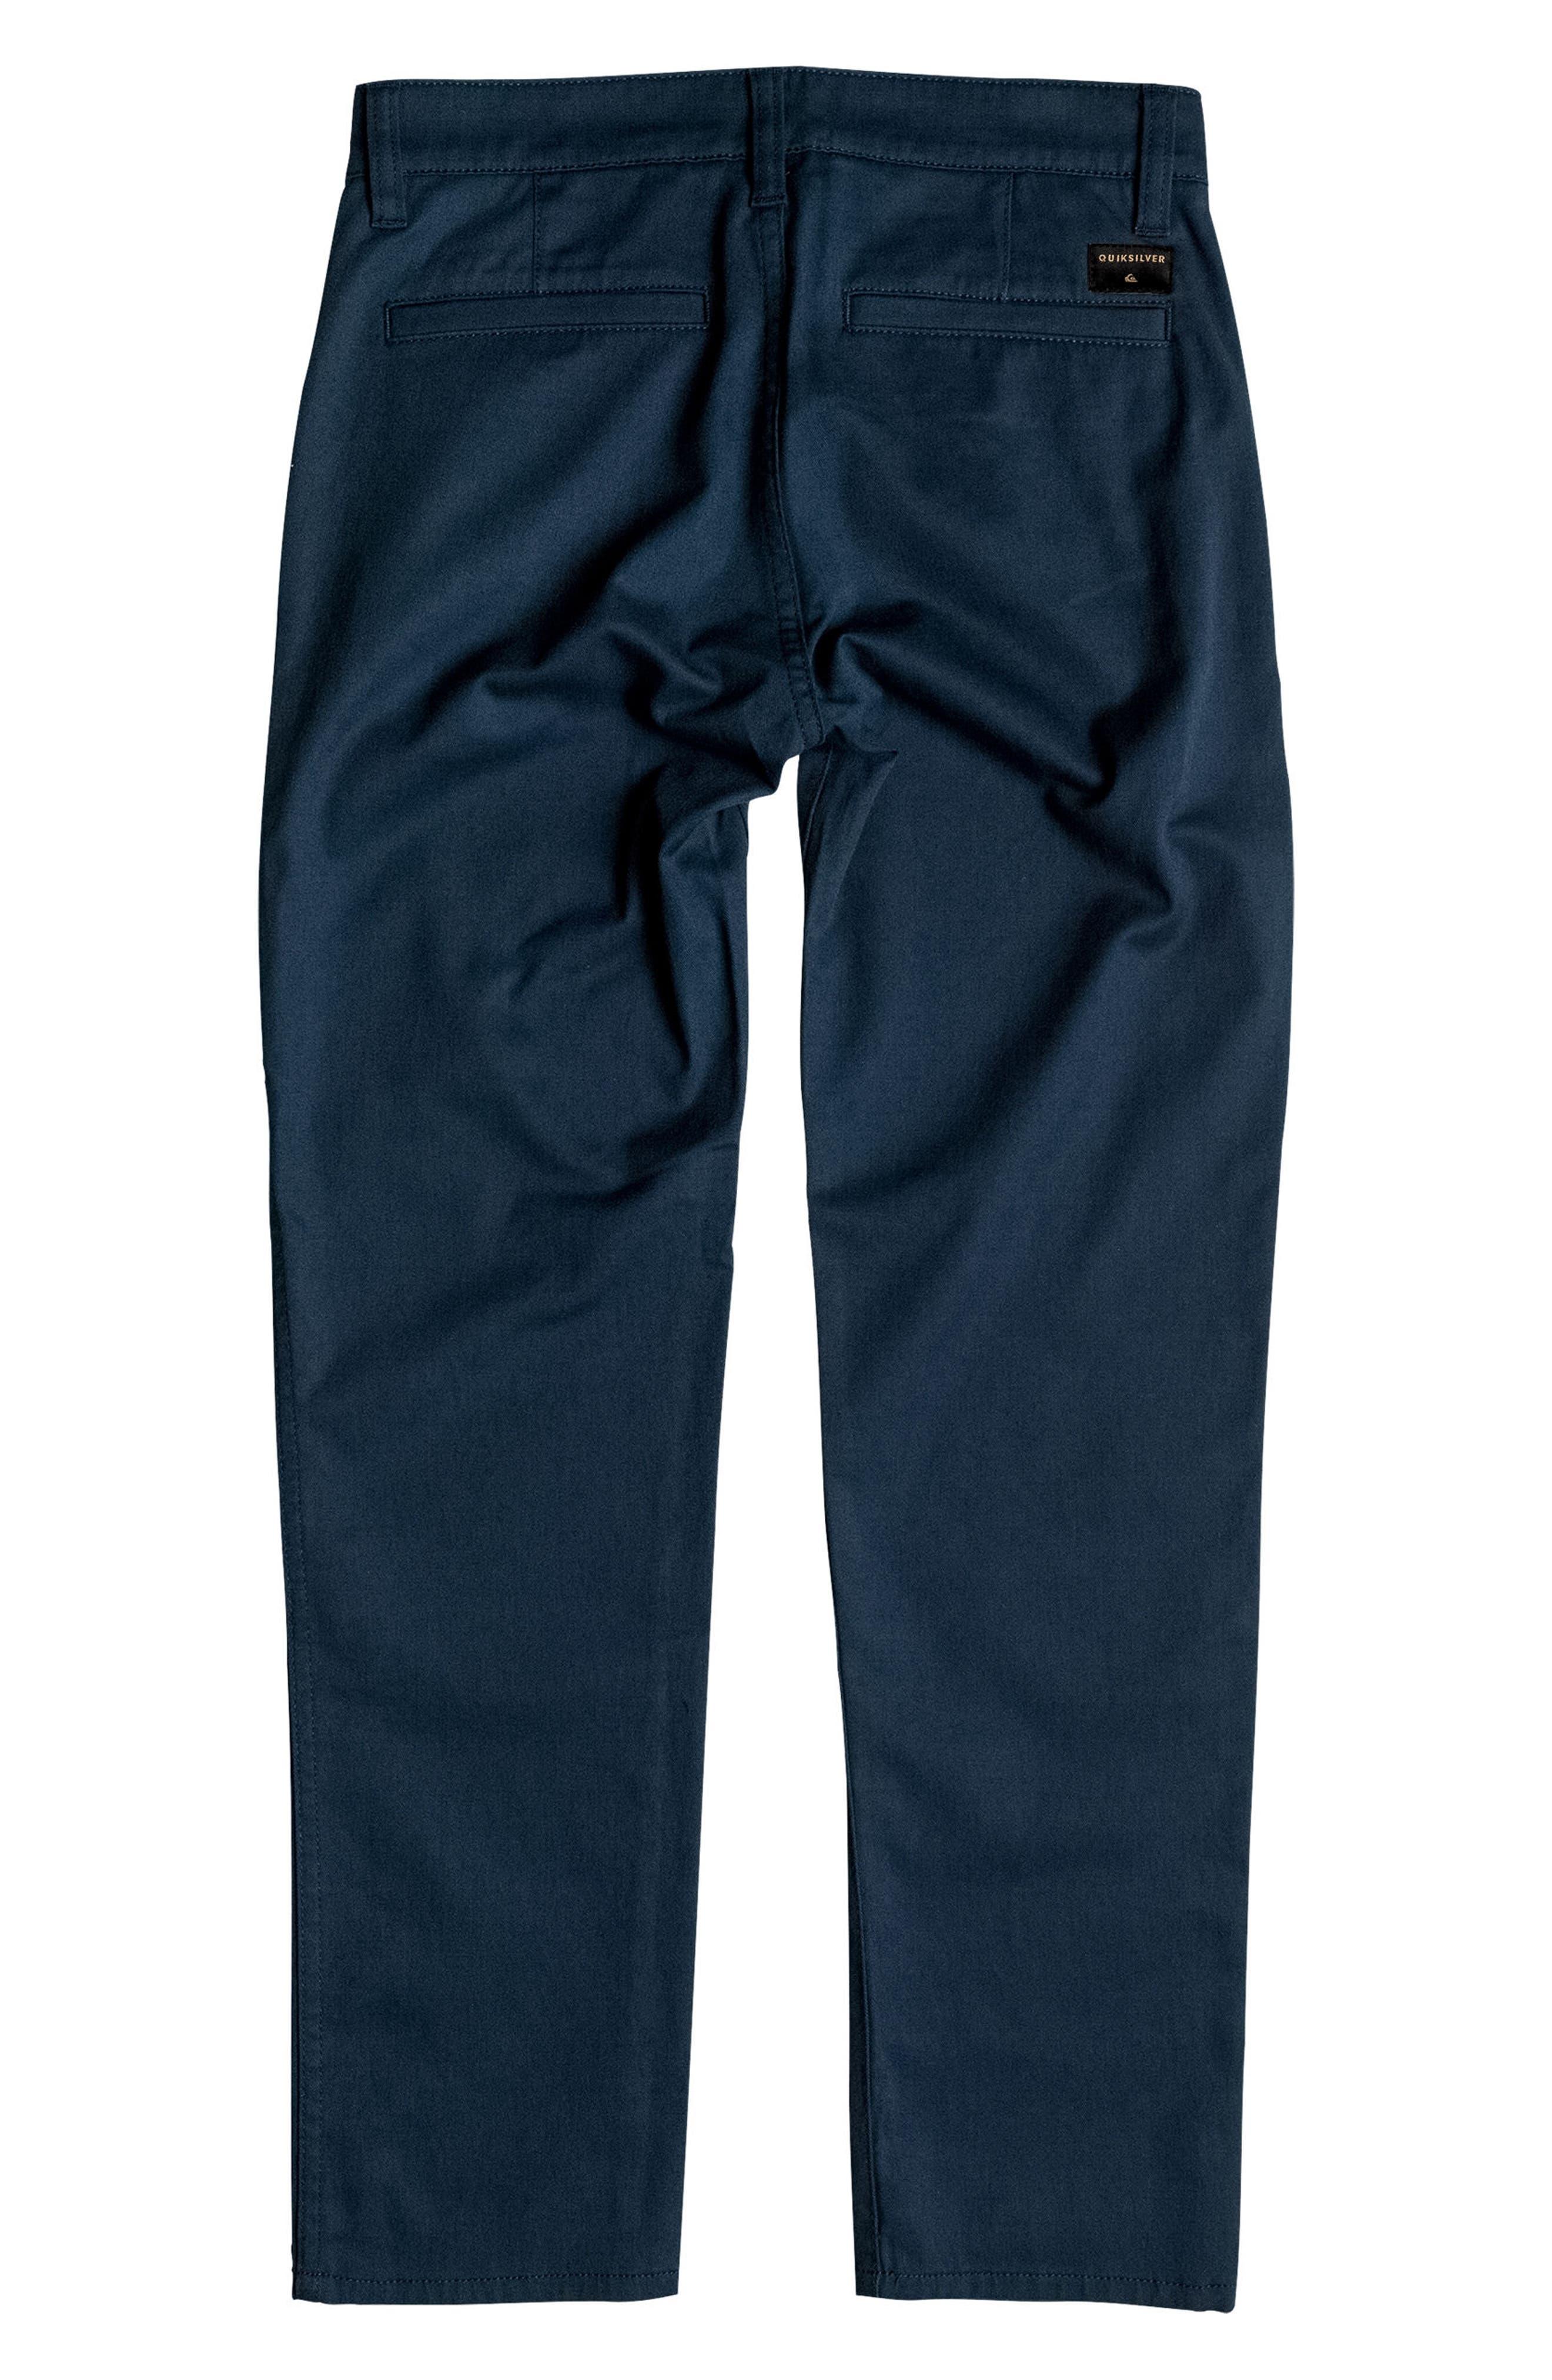 Regular Fit Everyday Union Pants,                             Alternate thumbnail 2, color,                             Navy Blazer